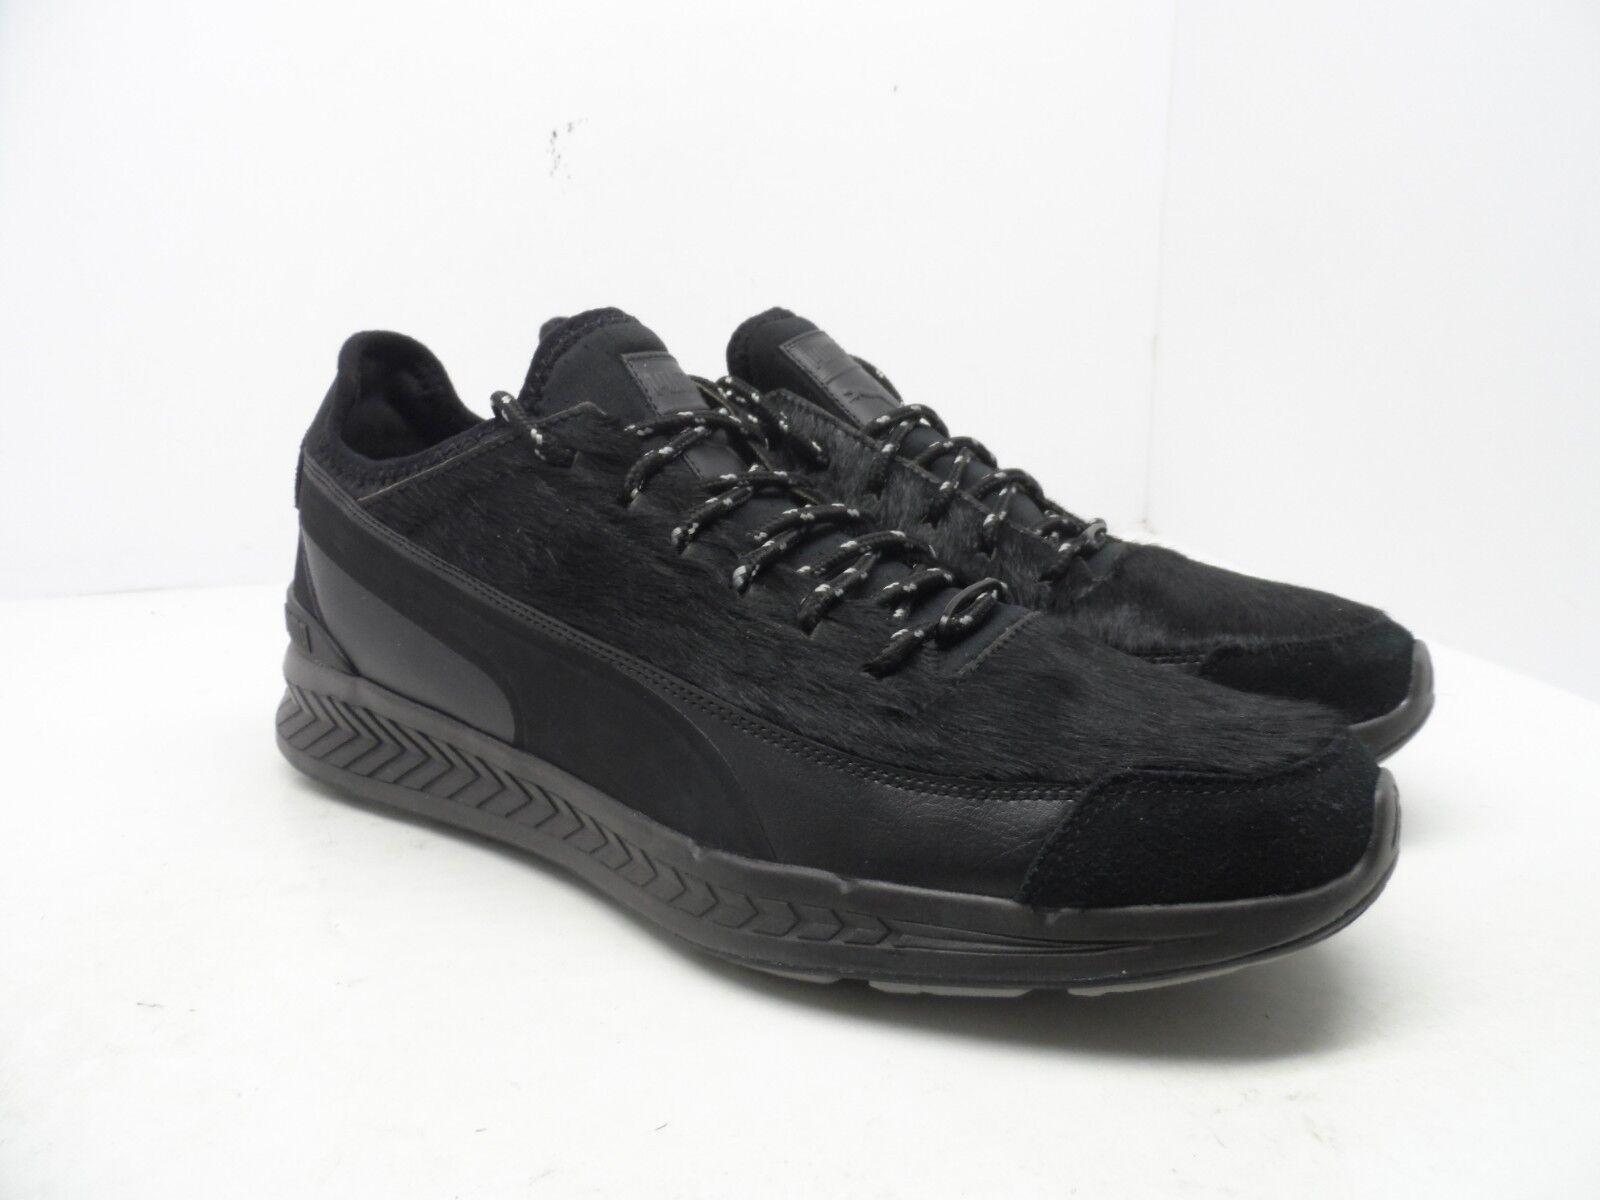 Puma Men's Ignite Sock Camping Sneakers shoes Black Size 12M